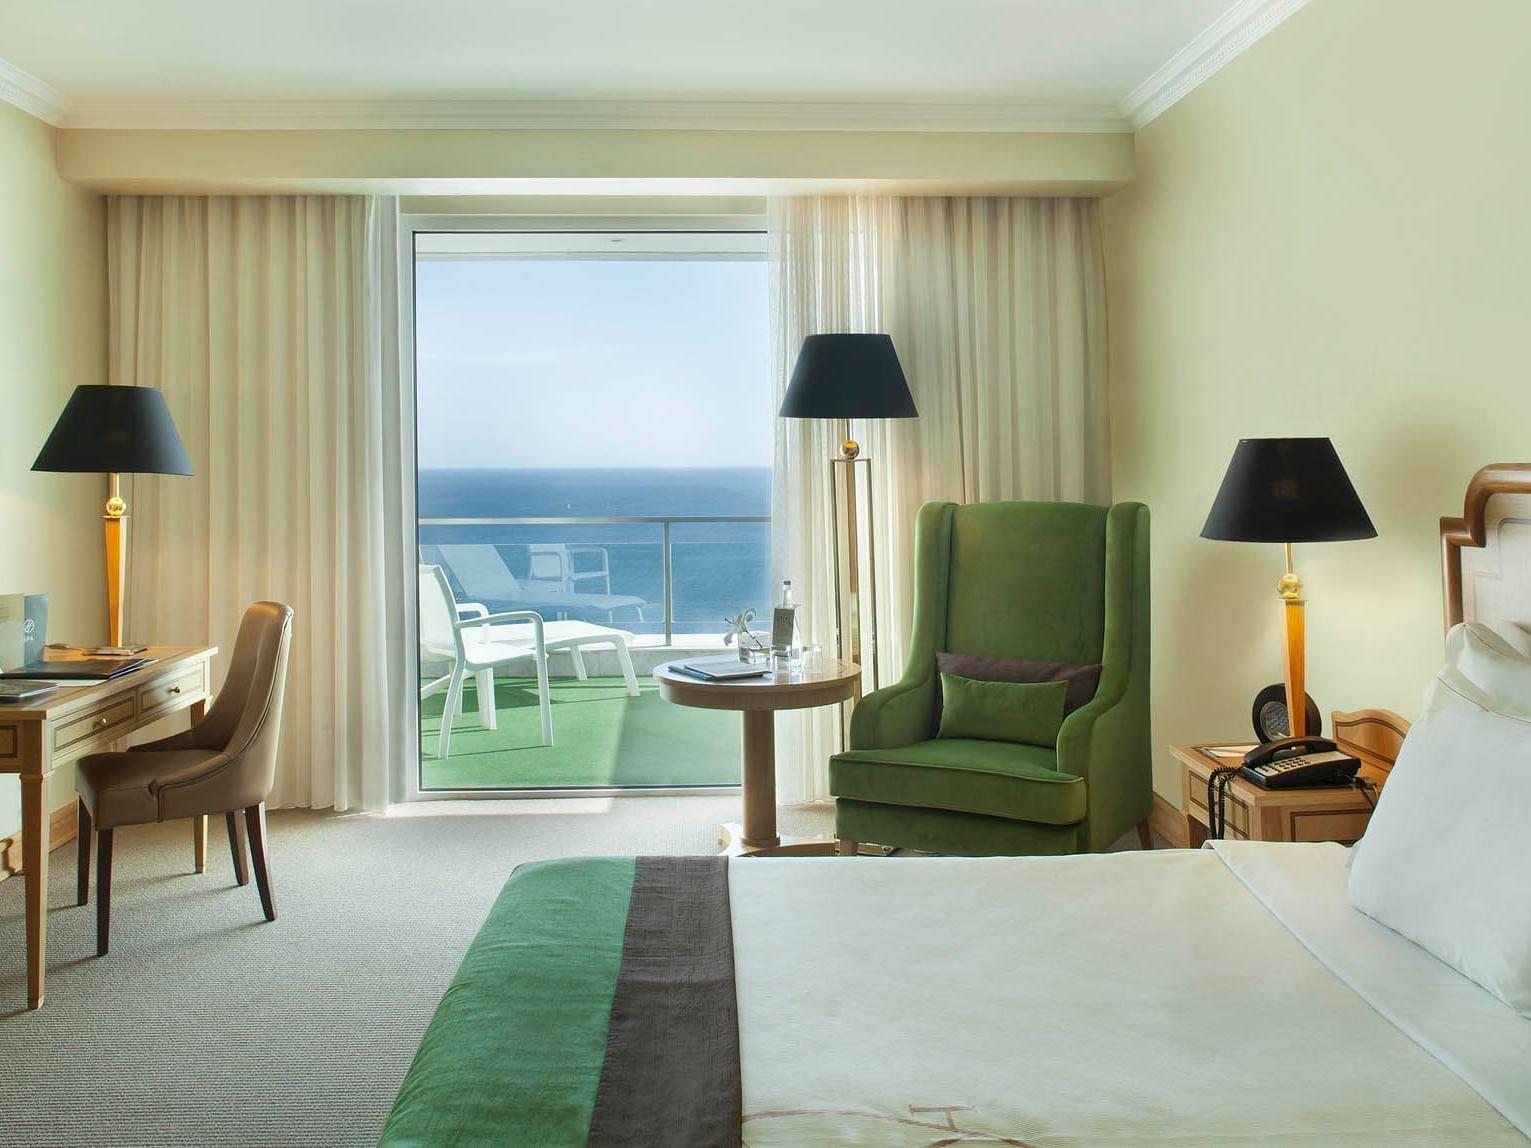 MOMENTOS MIRAGEM en el Hotel Cascais Miragem Health & Spa